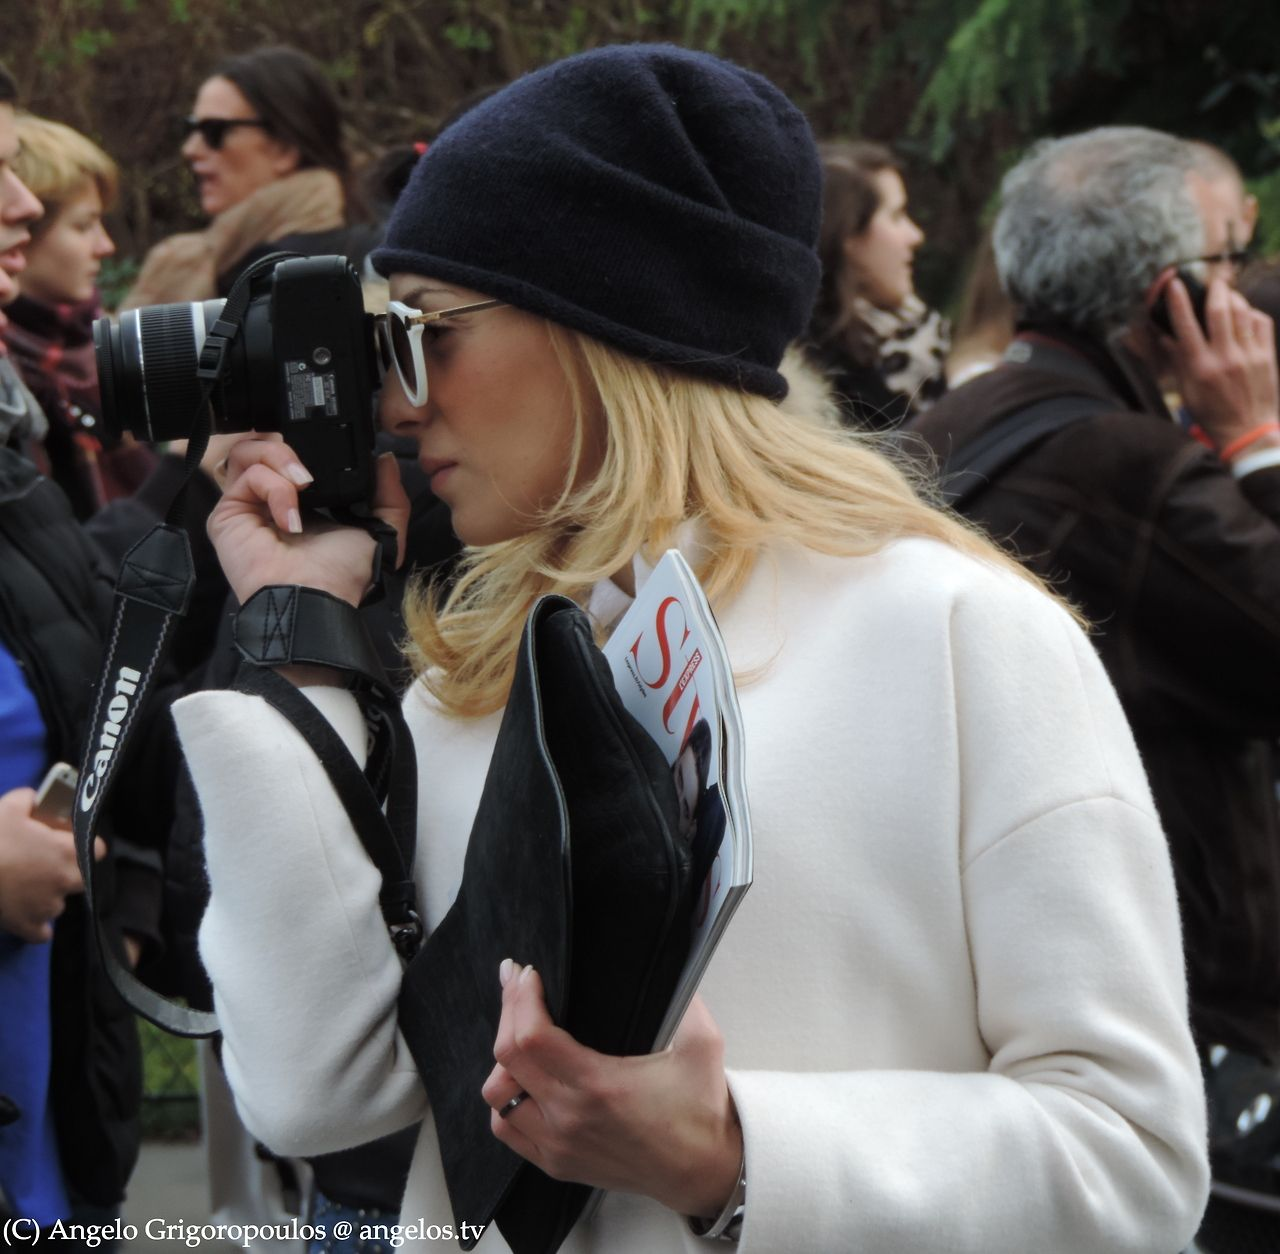 Paris Fashion Week Febr 2014 - Photo by Angelo Grigoropoulos @ angelos.tv